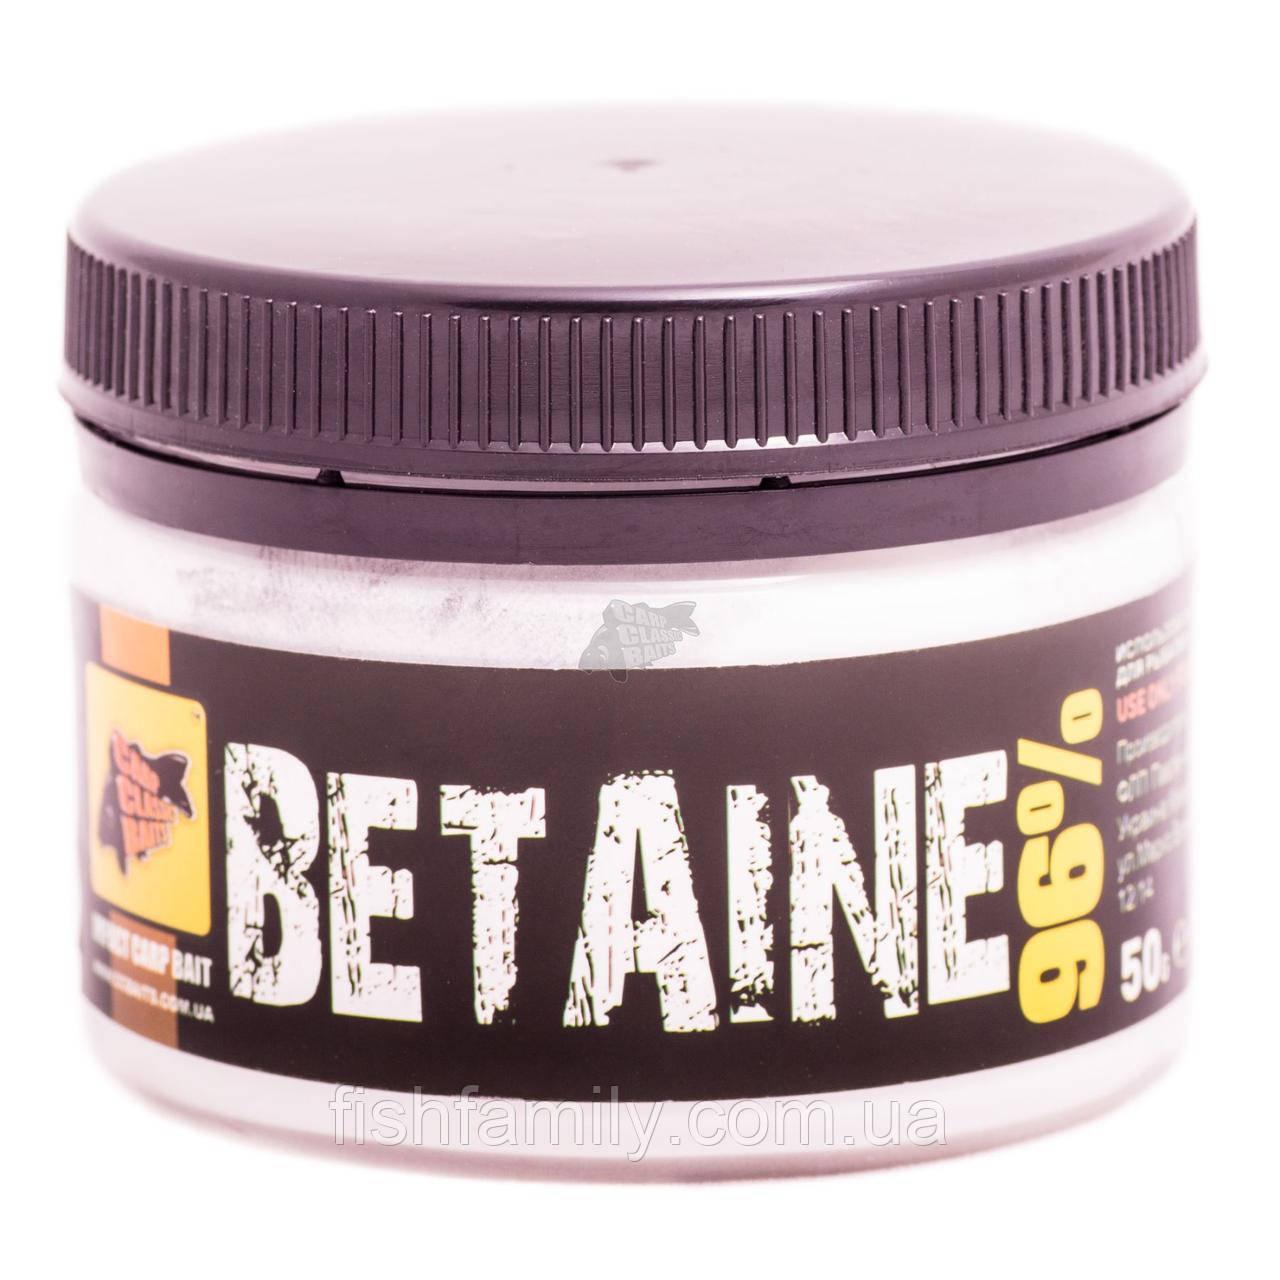 Добавка Betain 96%, 50гр, 50 гр